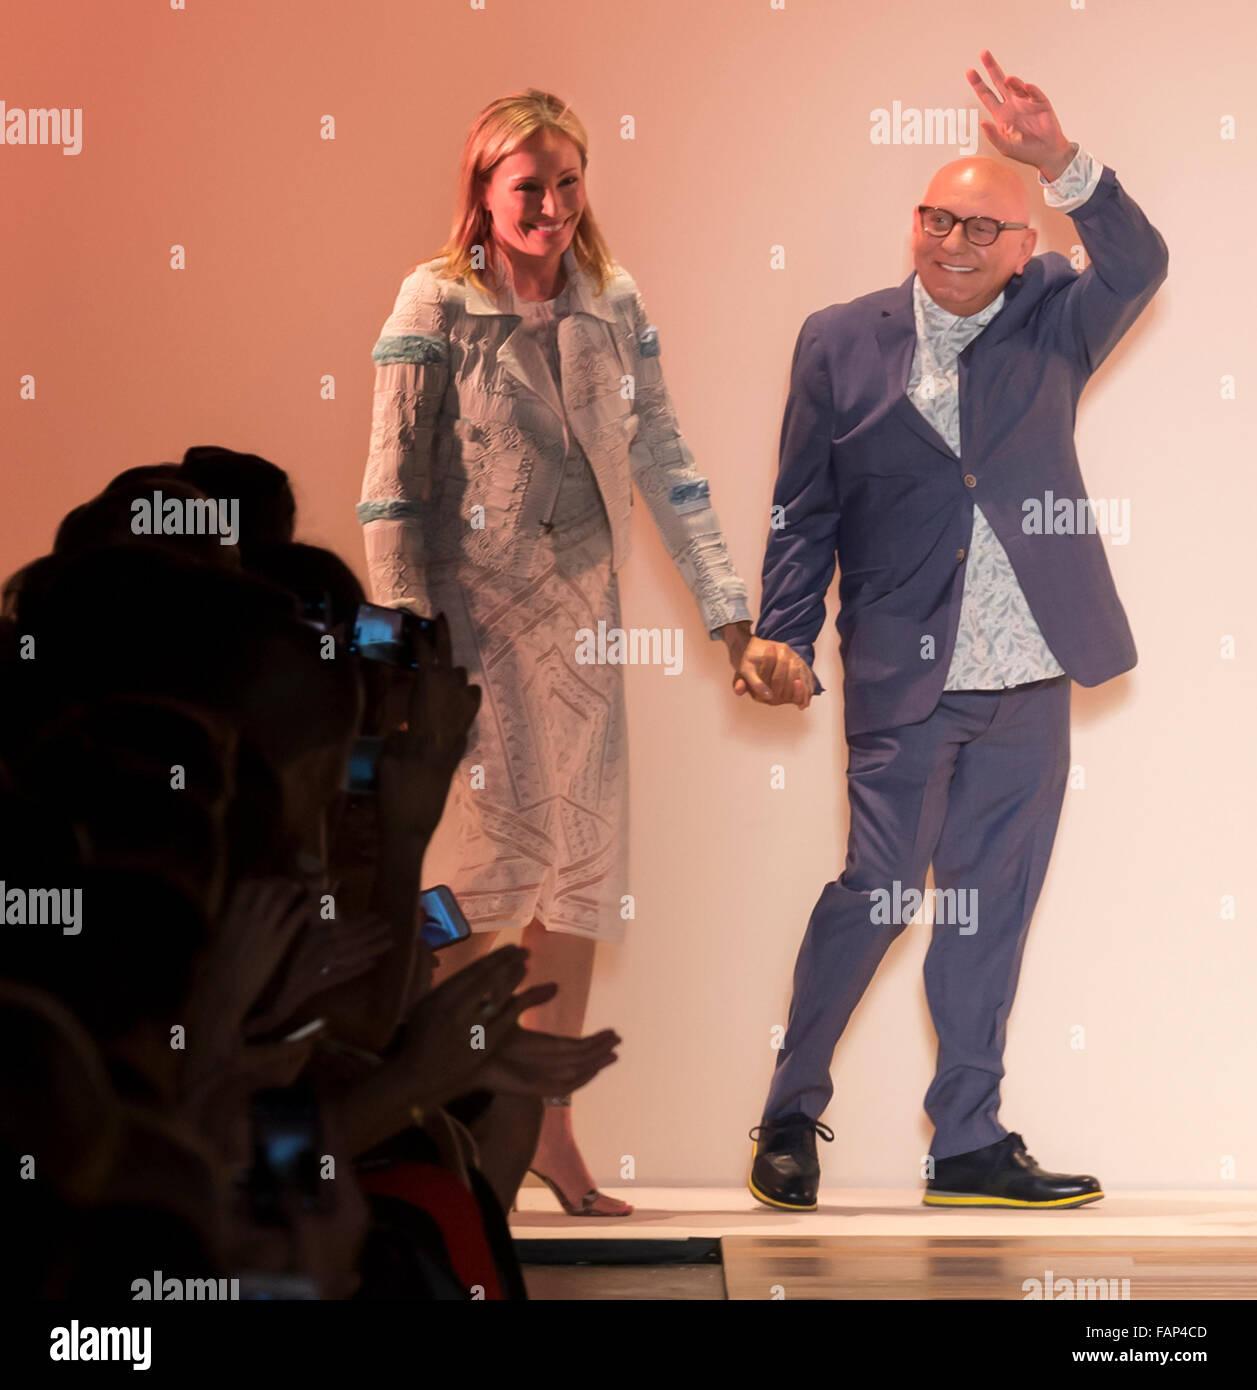 New York, NY - September 10, 2015: Designer Max and Lubov Azria walk the runway at the BCBG Max Azria show during - Stock Image